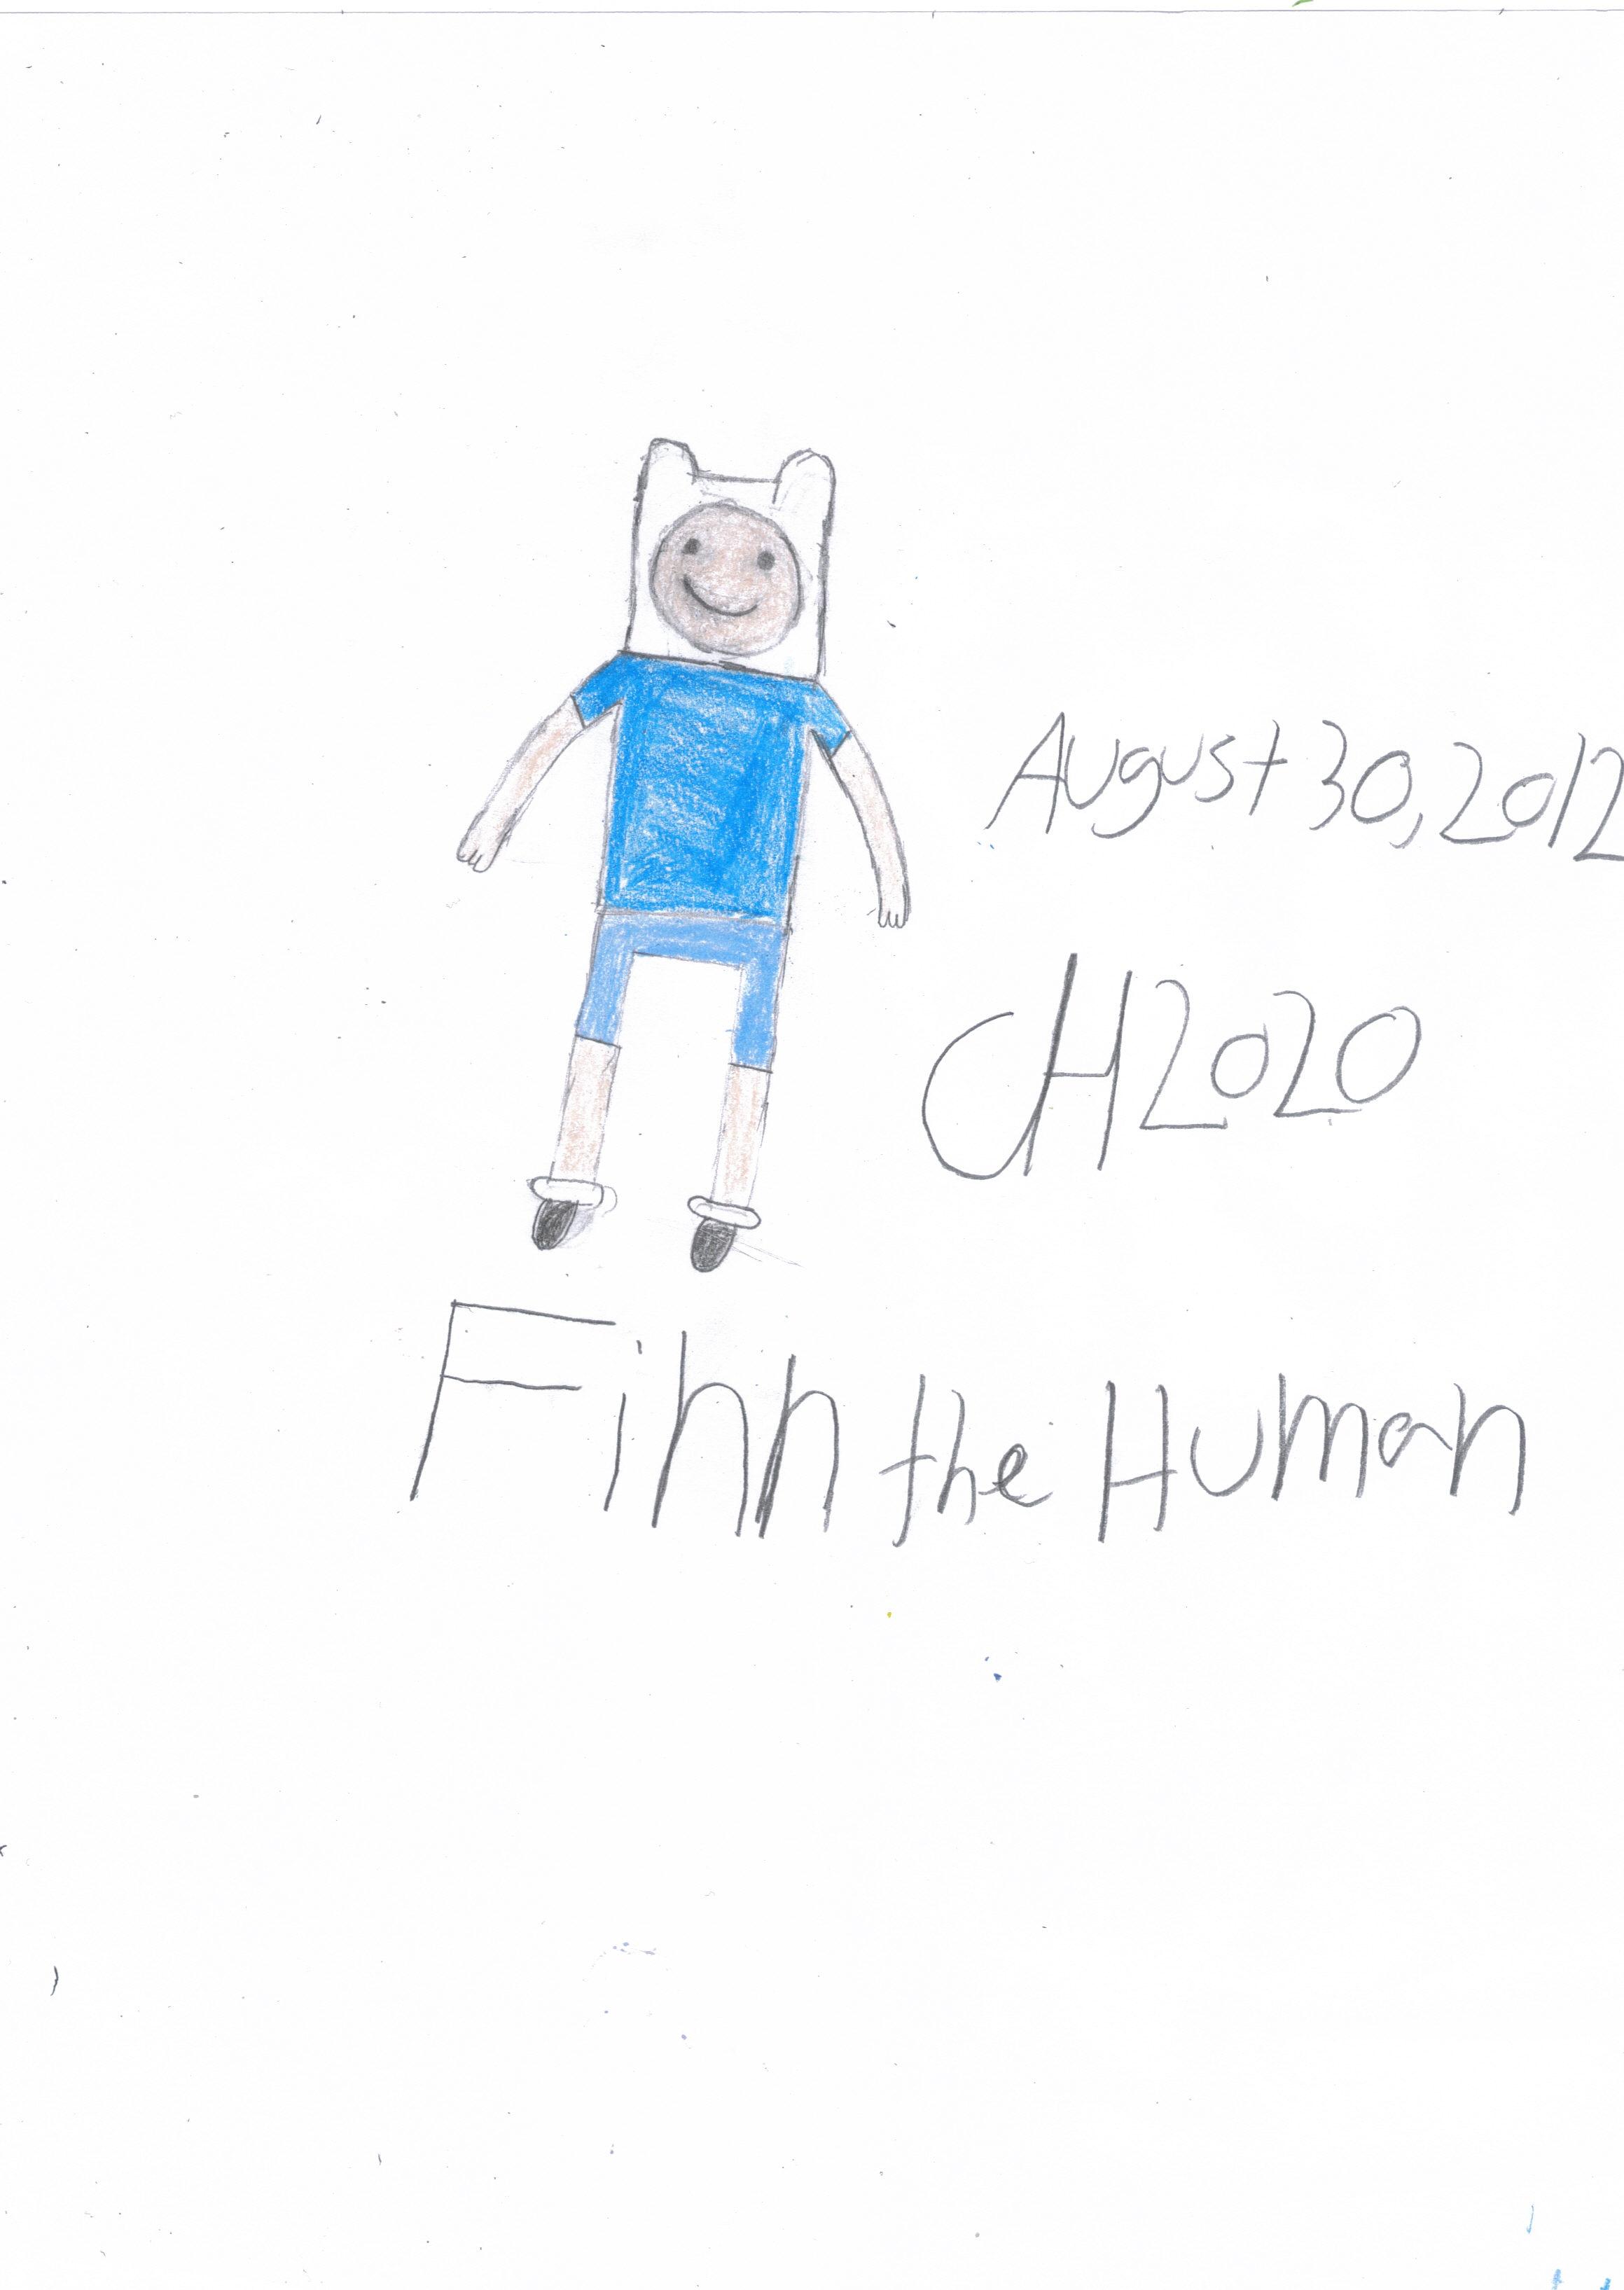 Finn the human August 30,2012 by Chernandez2020